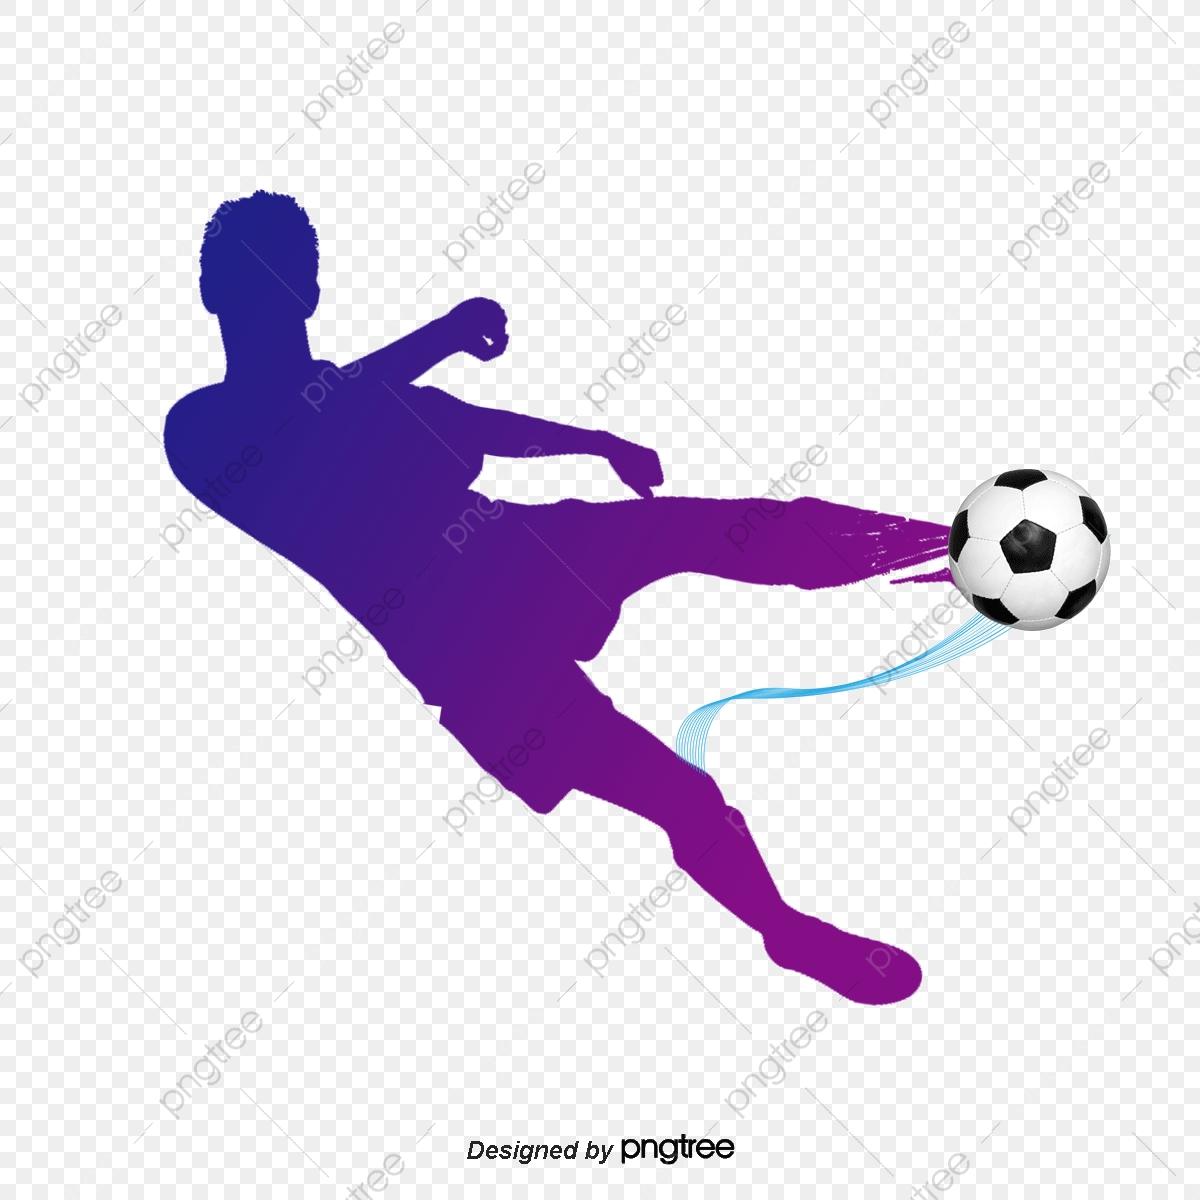 Jugadores De Futbol Vector Descargar, Football, Atleta, Football PNG.